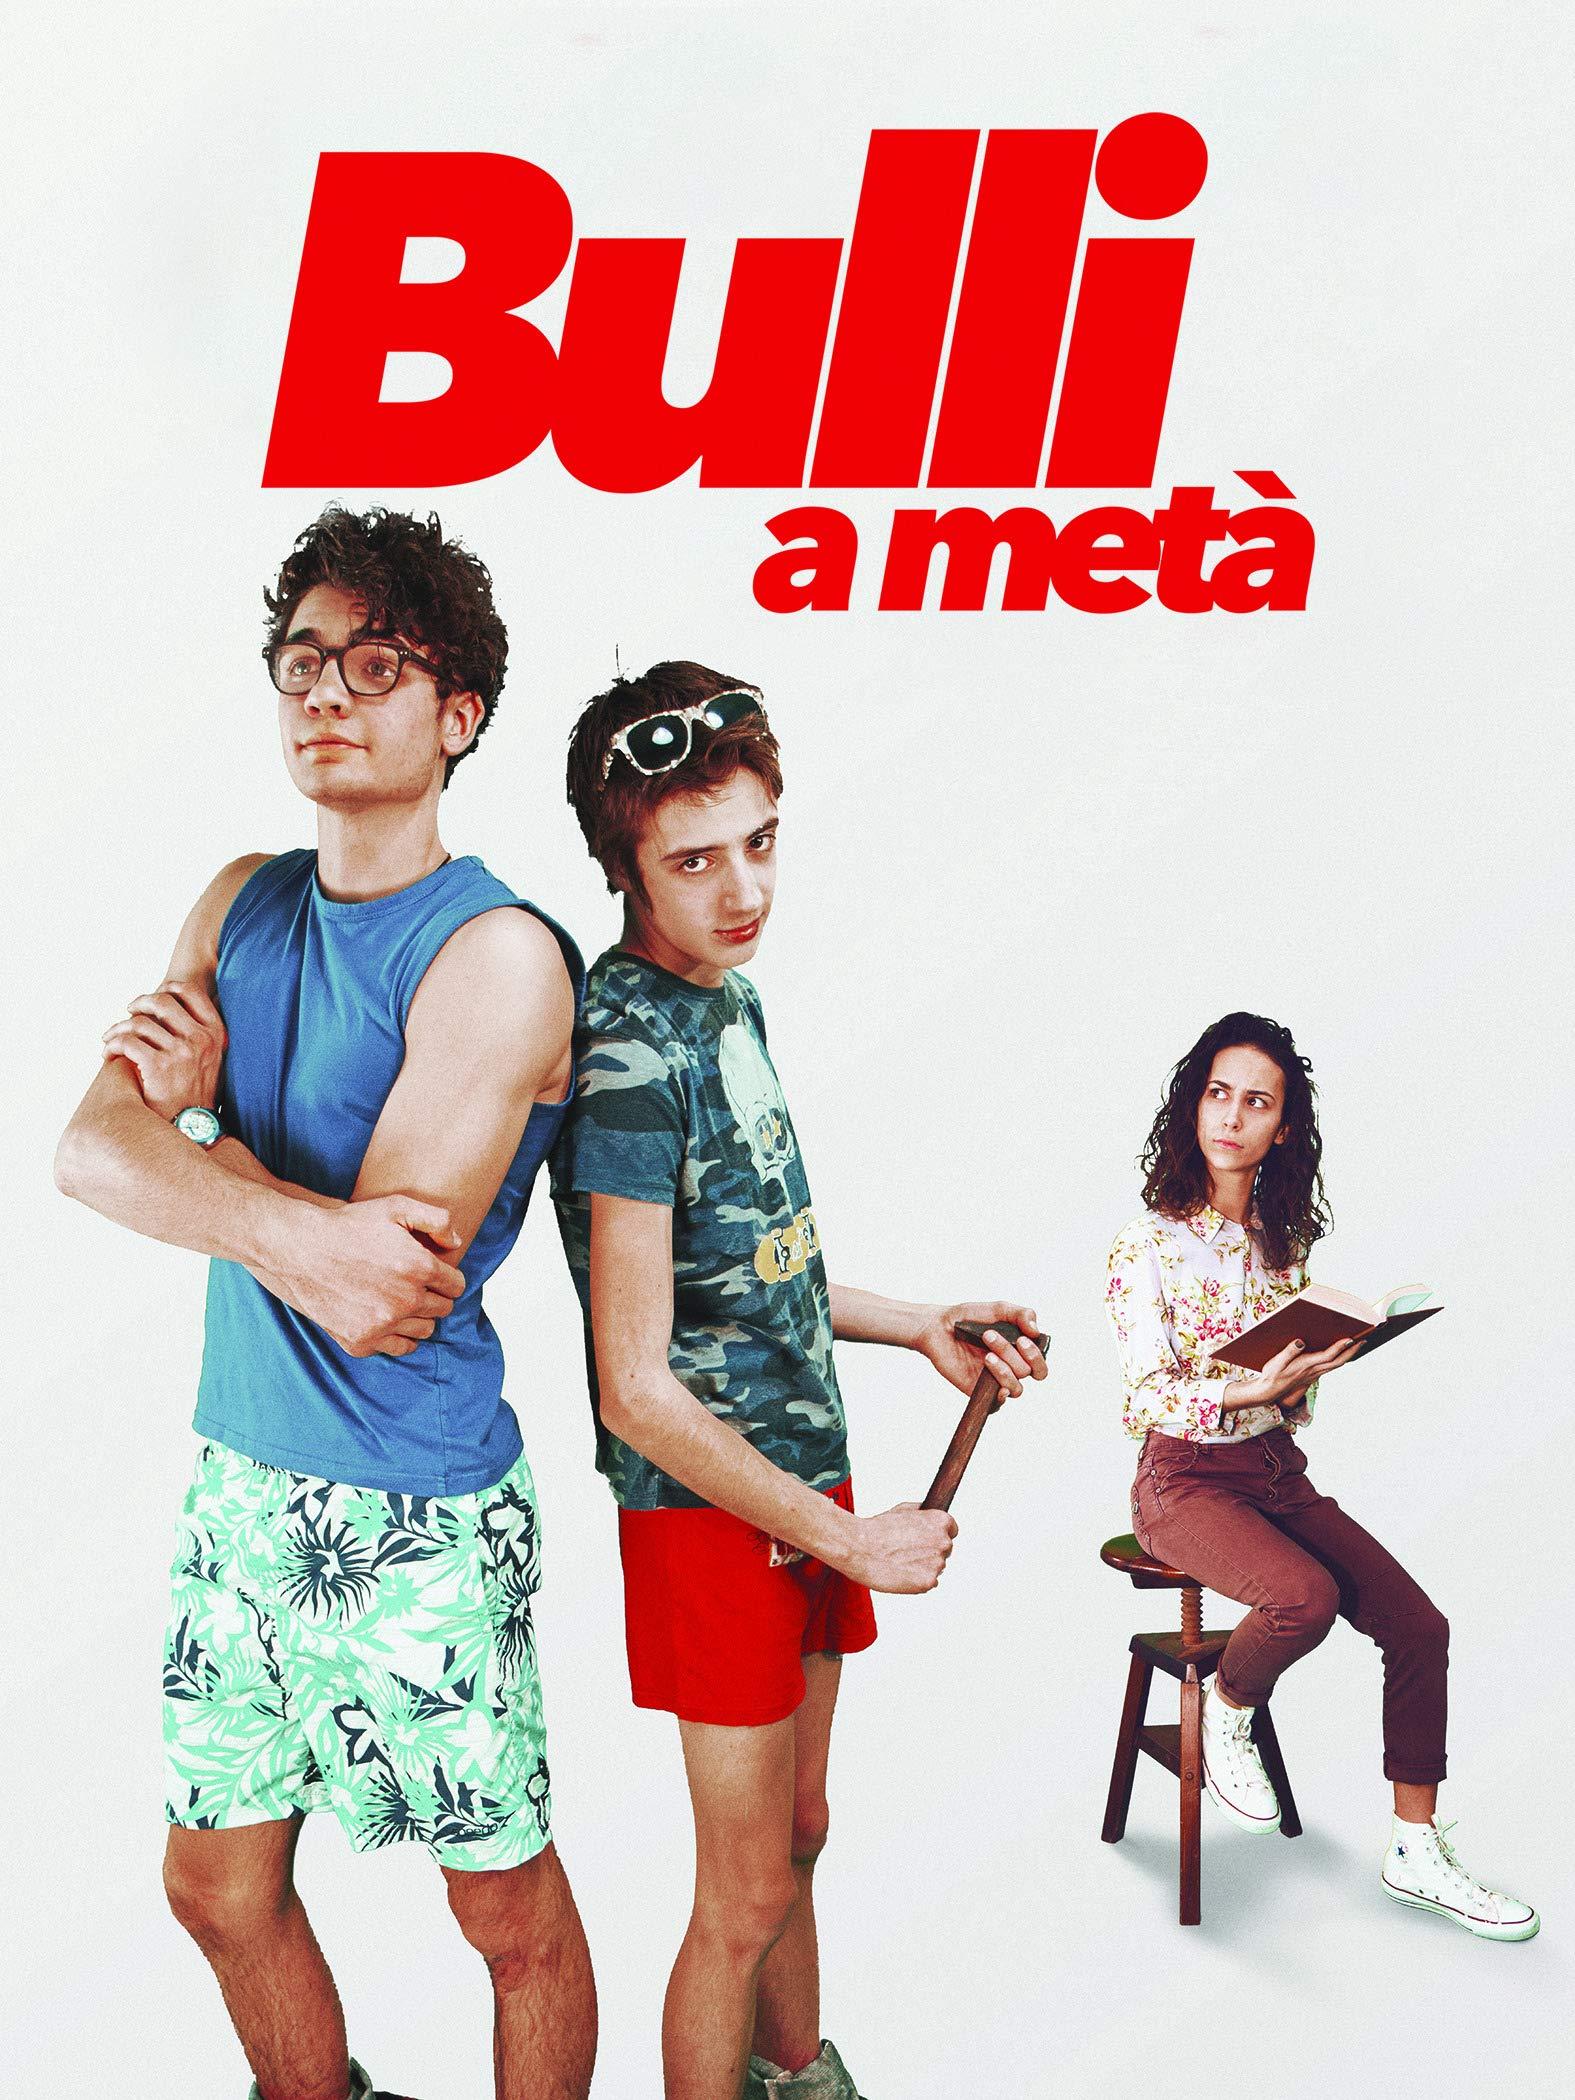 Bullies Half and Half